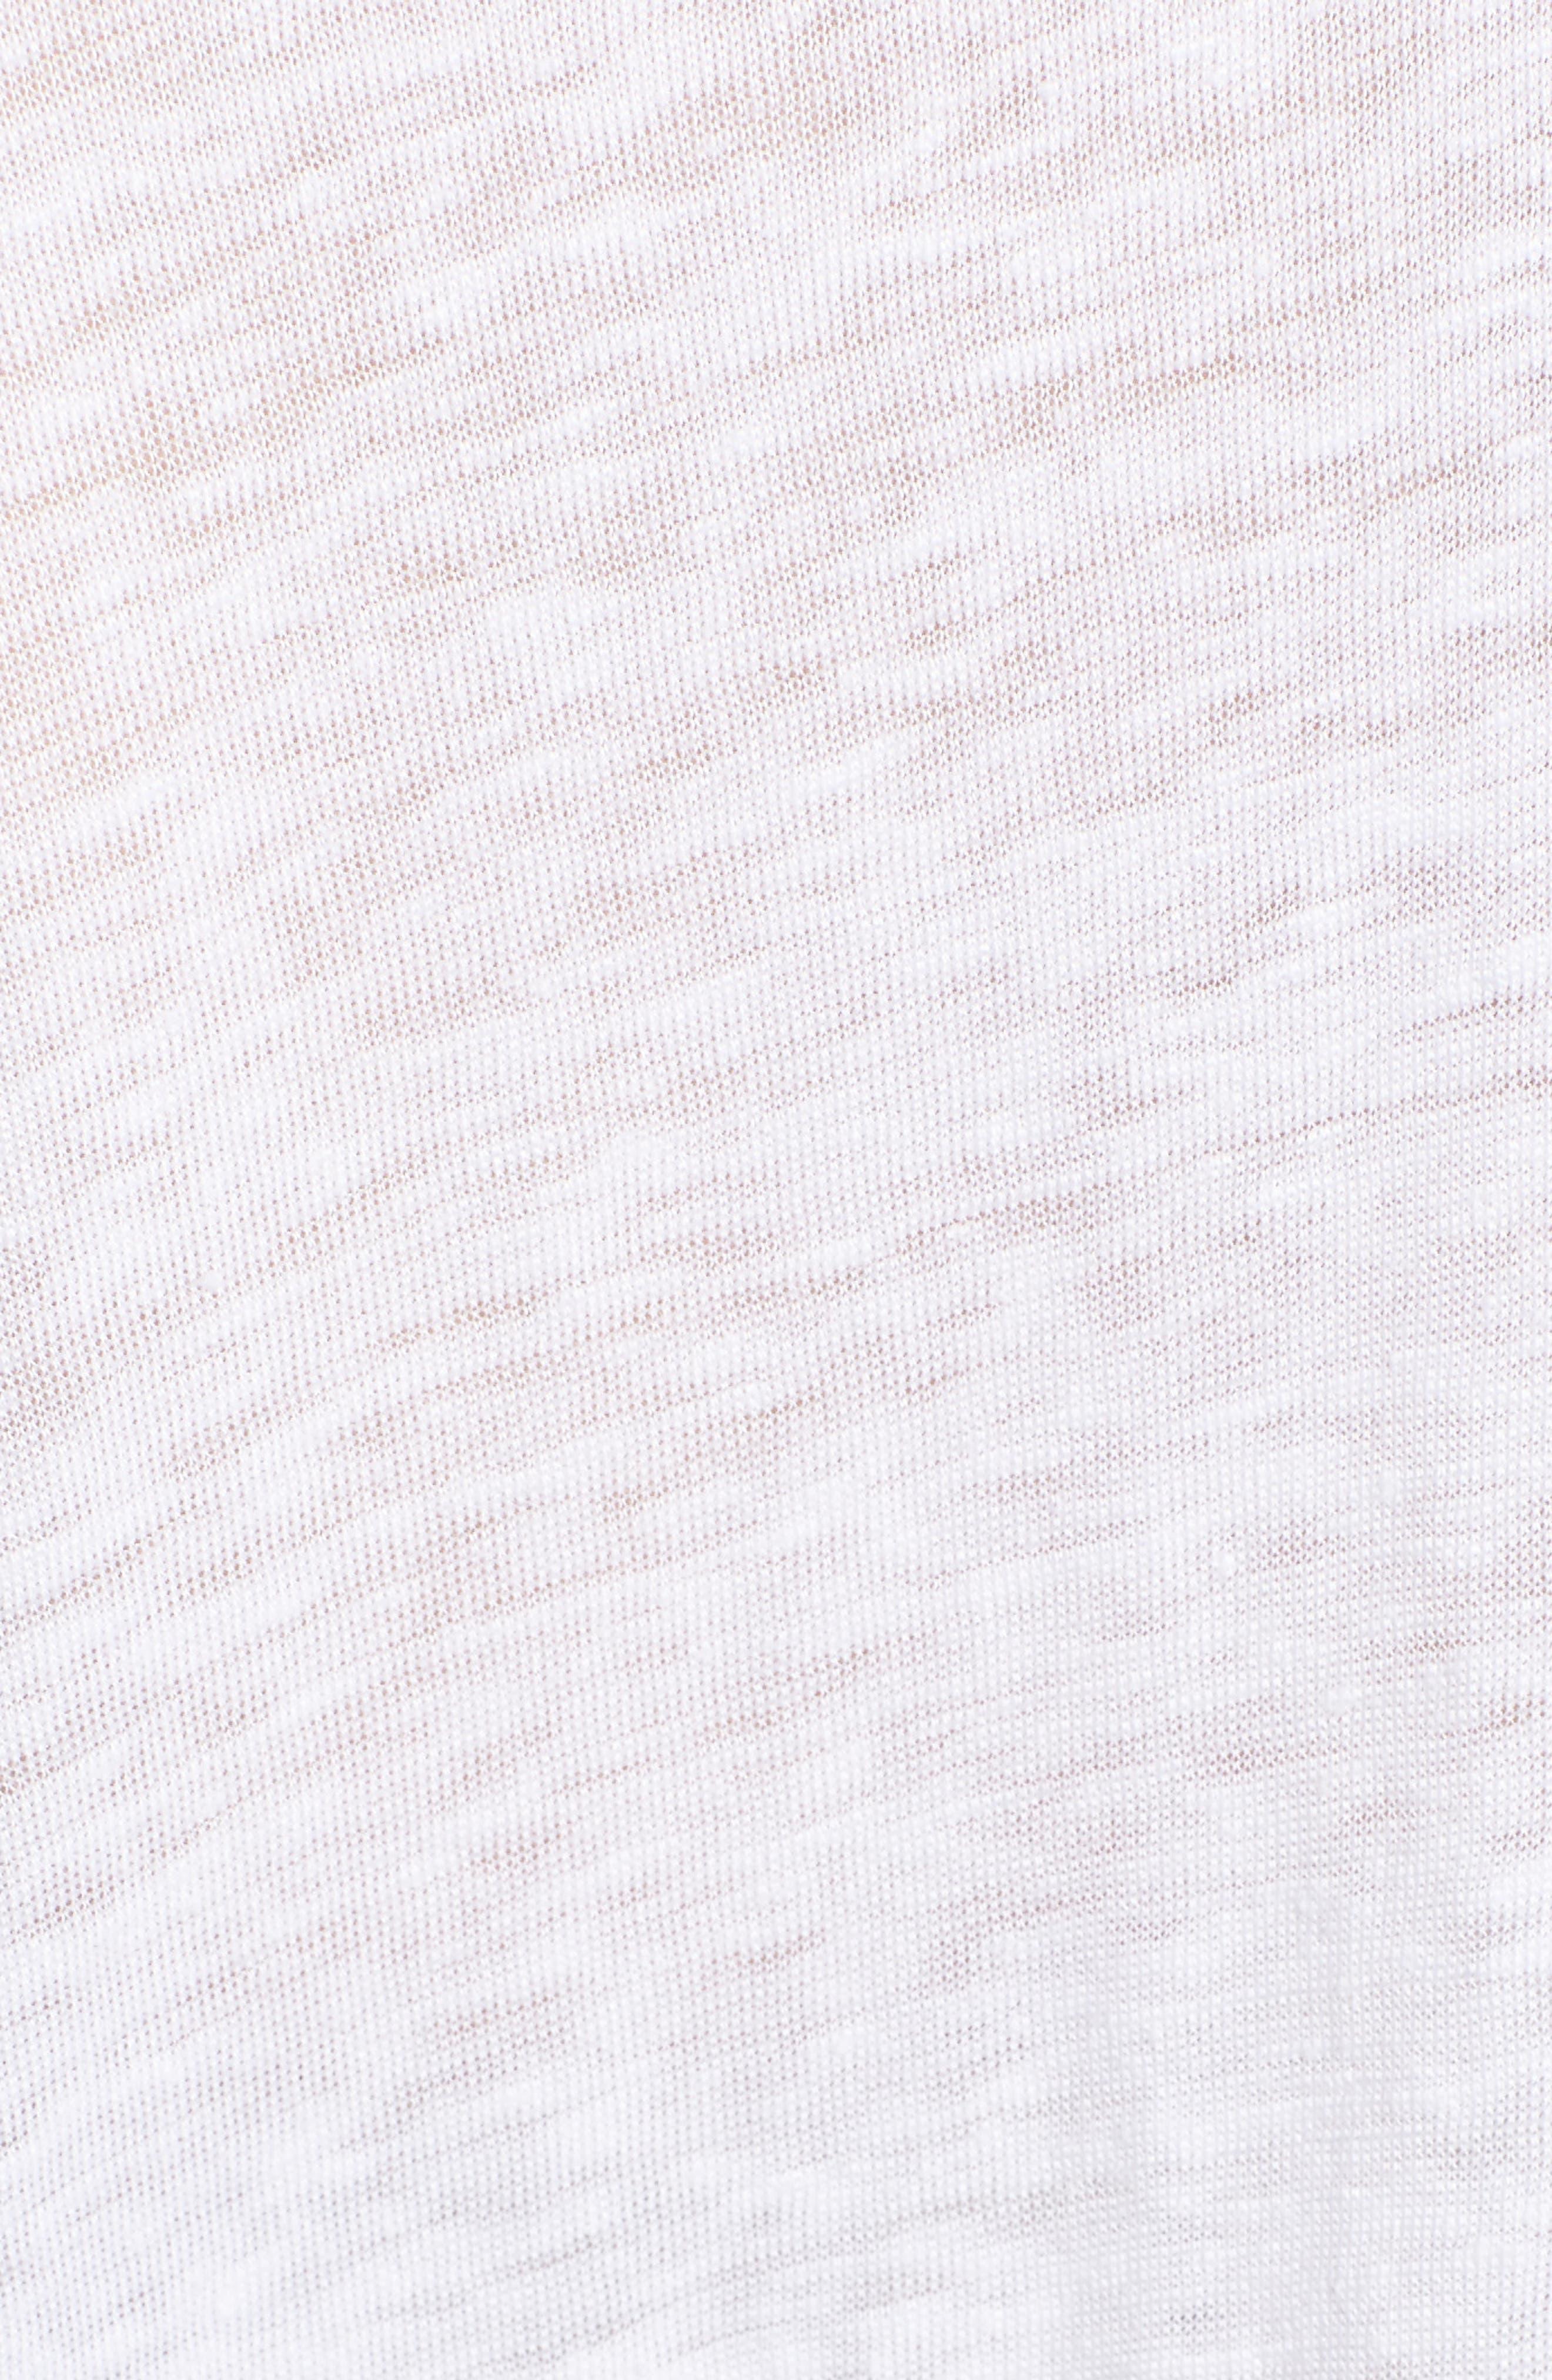 Lara Linen Blend Top with Pom Pom Trim,                             Alternate thumbnail 5, color,                             153